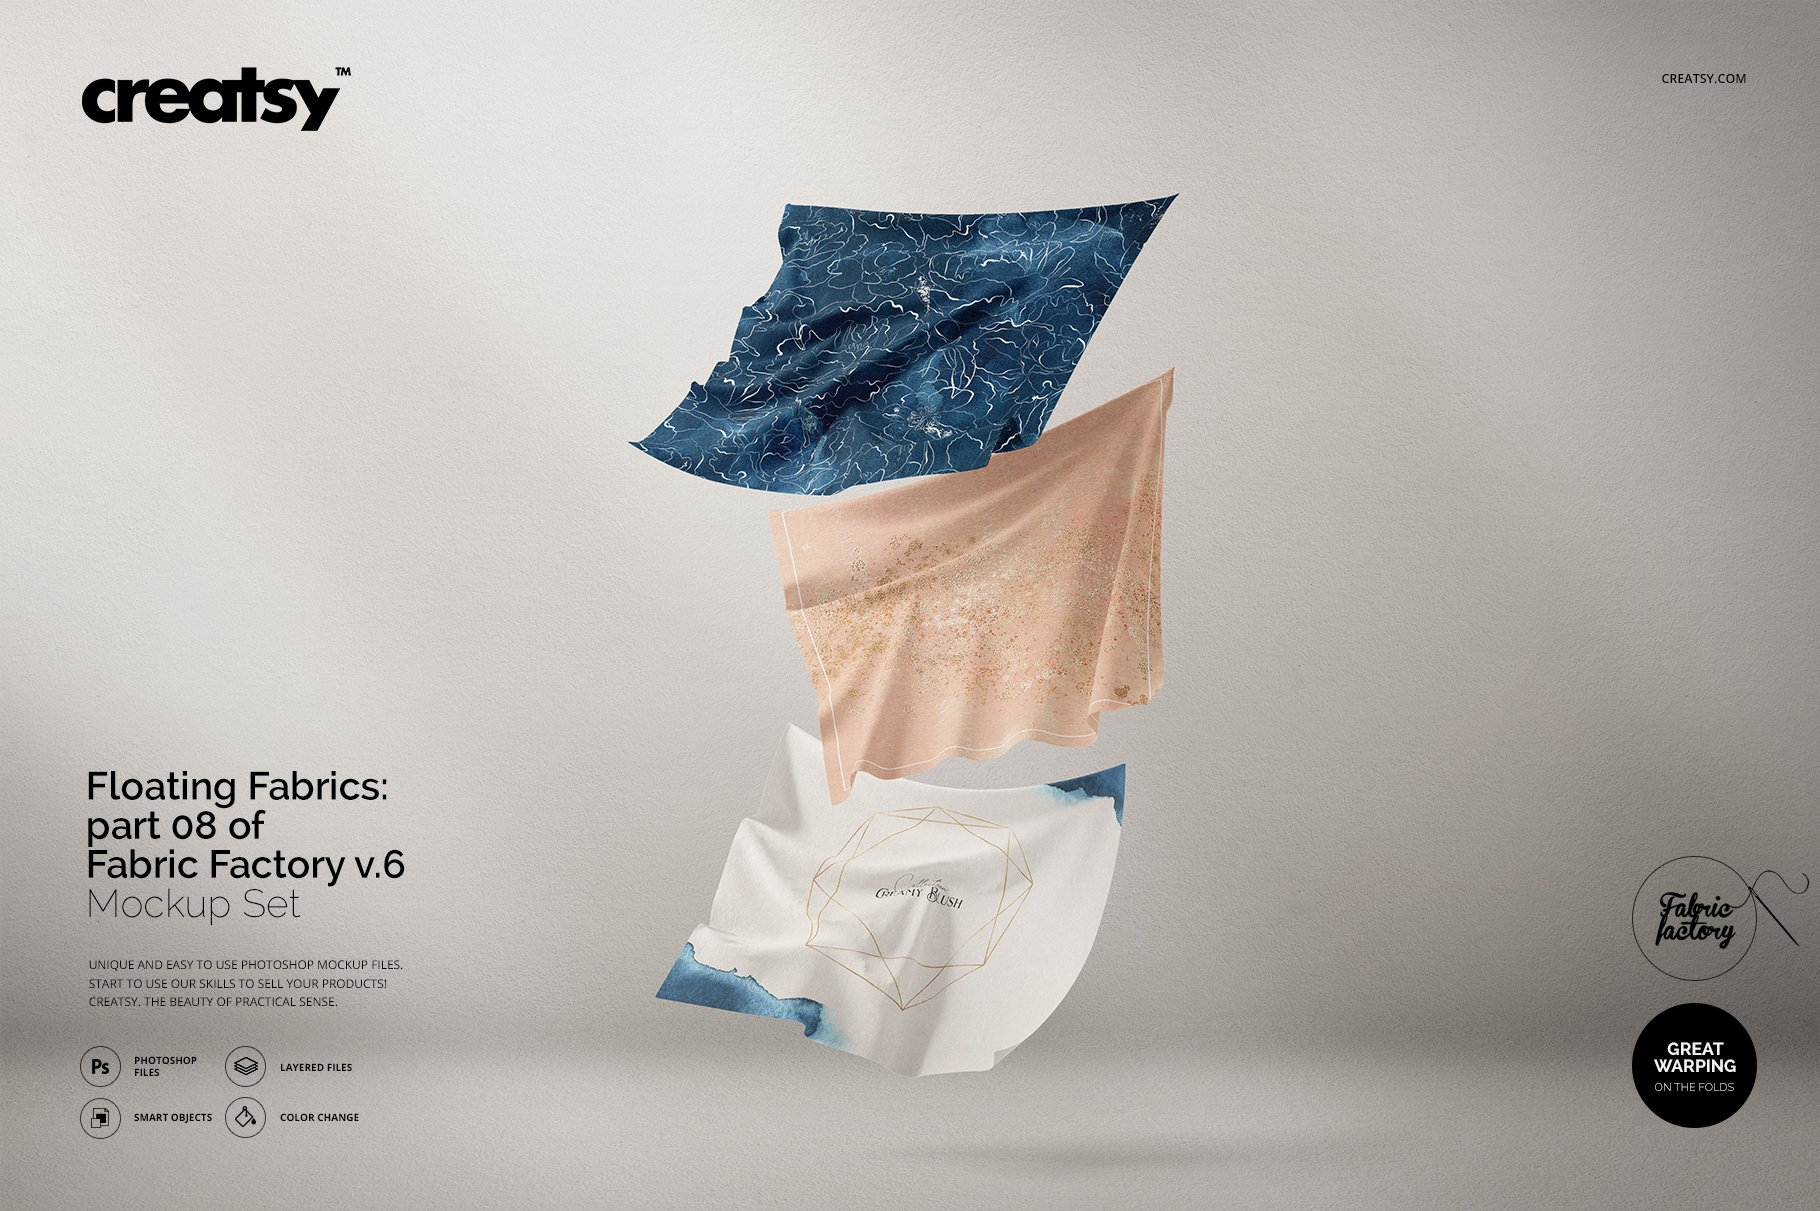 悬浮纺织物方巾印花设计展示样机 Floating Fabrics Mockup 08/FF v.6插图